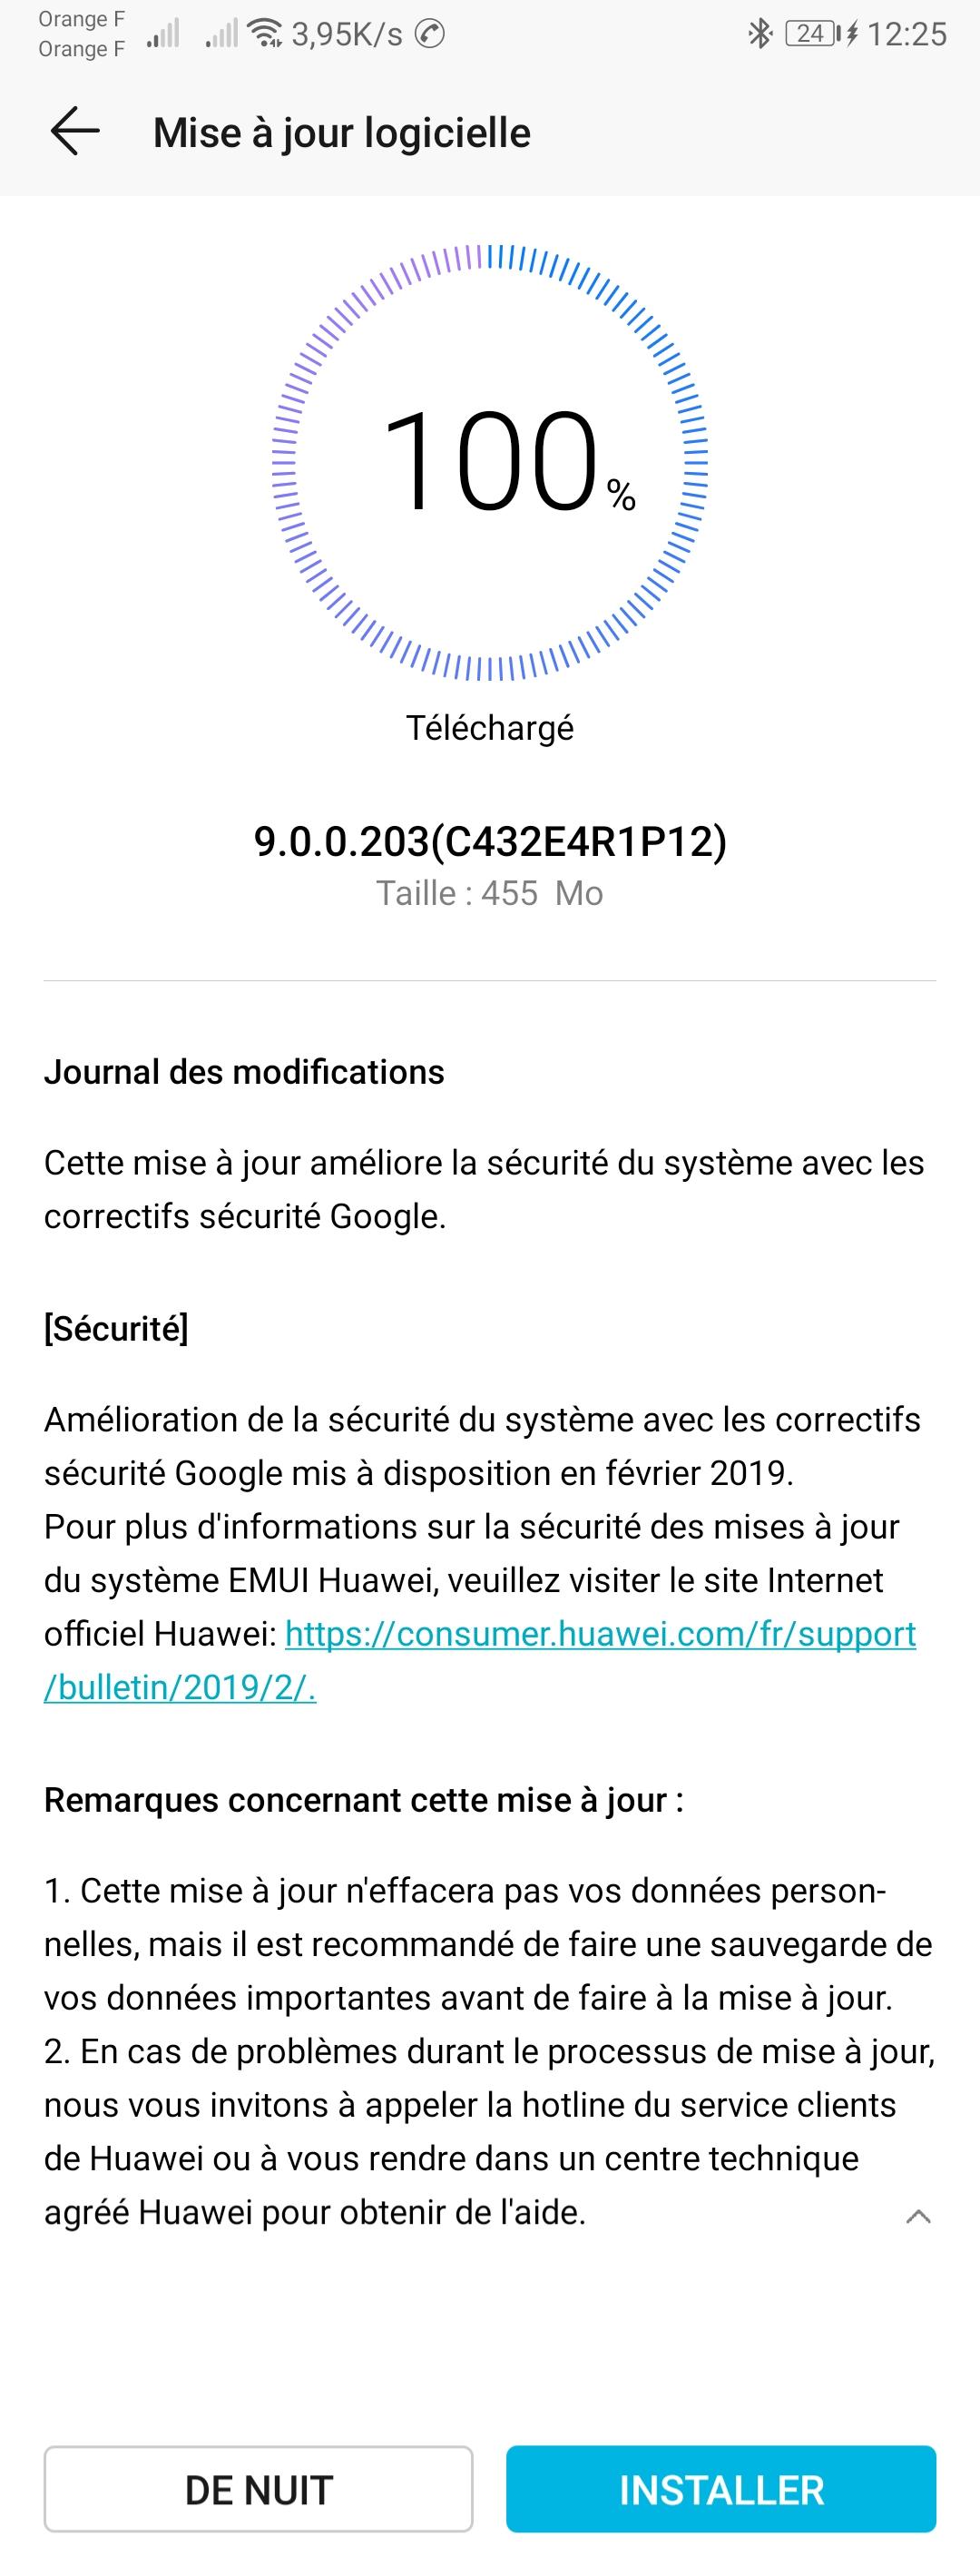 Screenshot_20190309_122515_com.huawei.android.hwouc